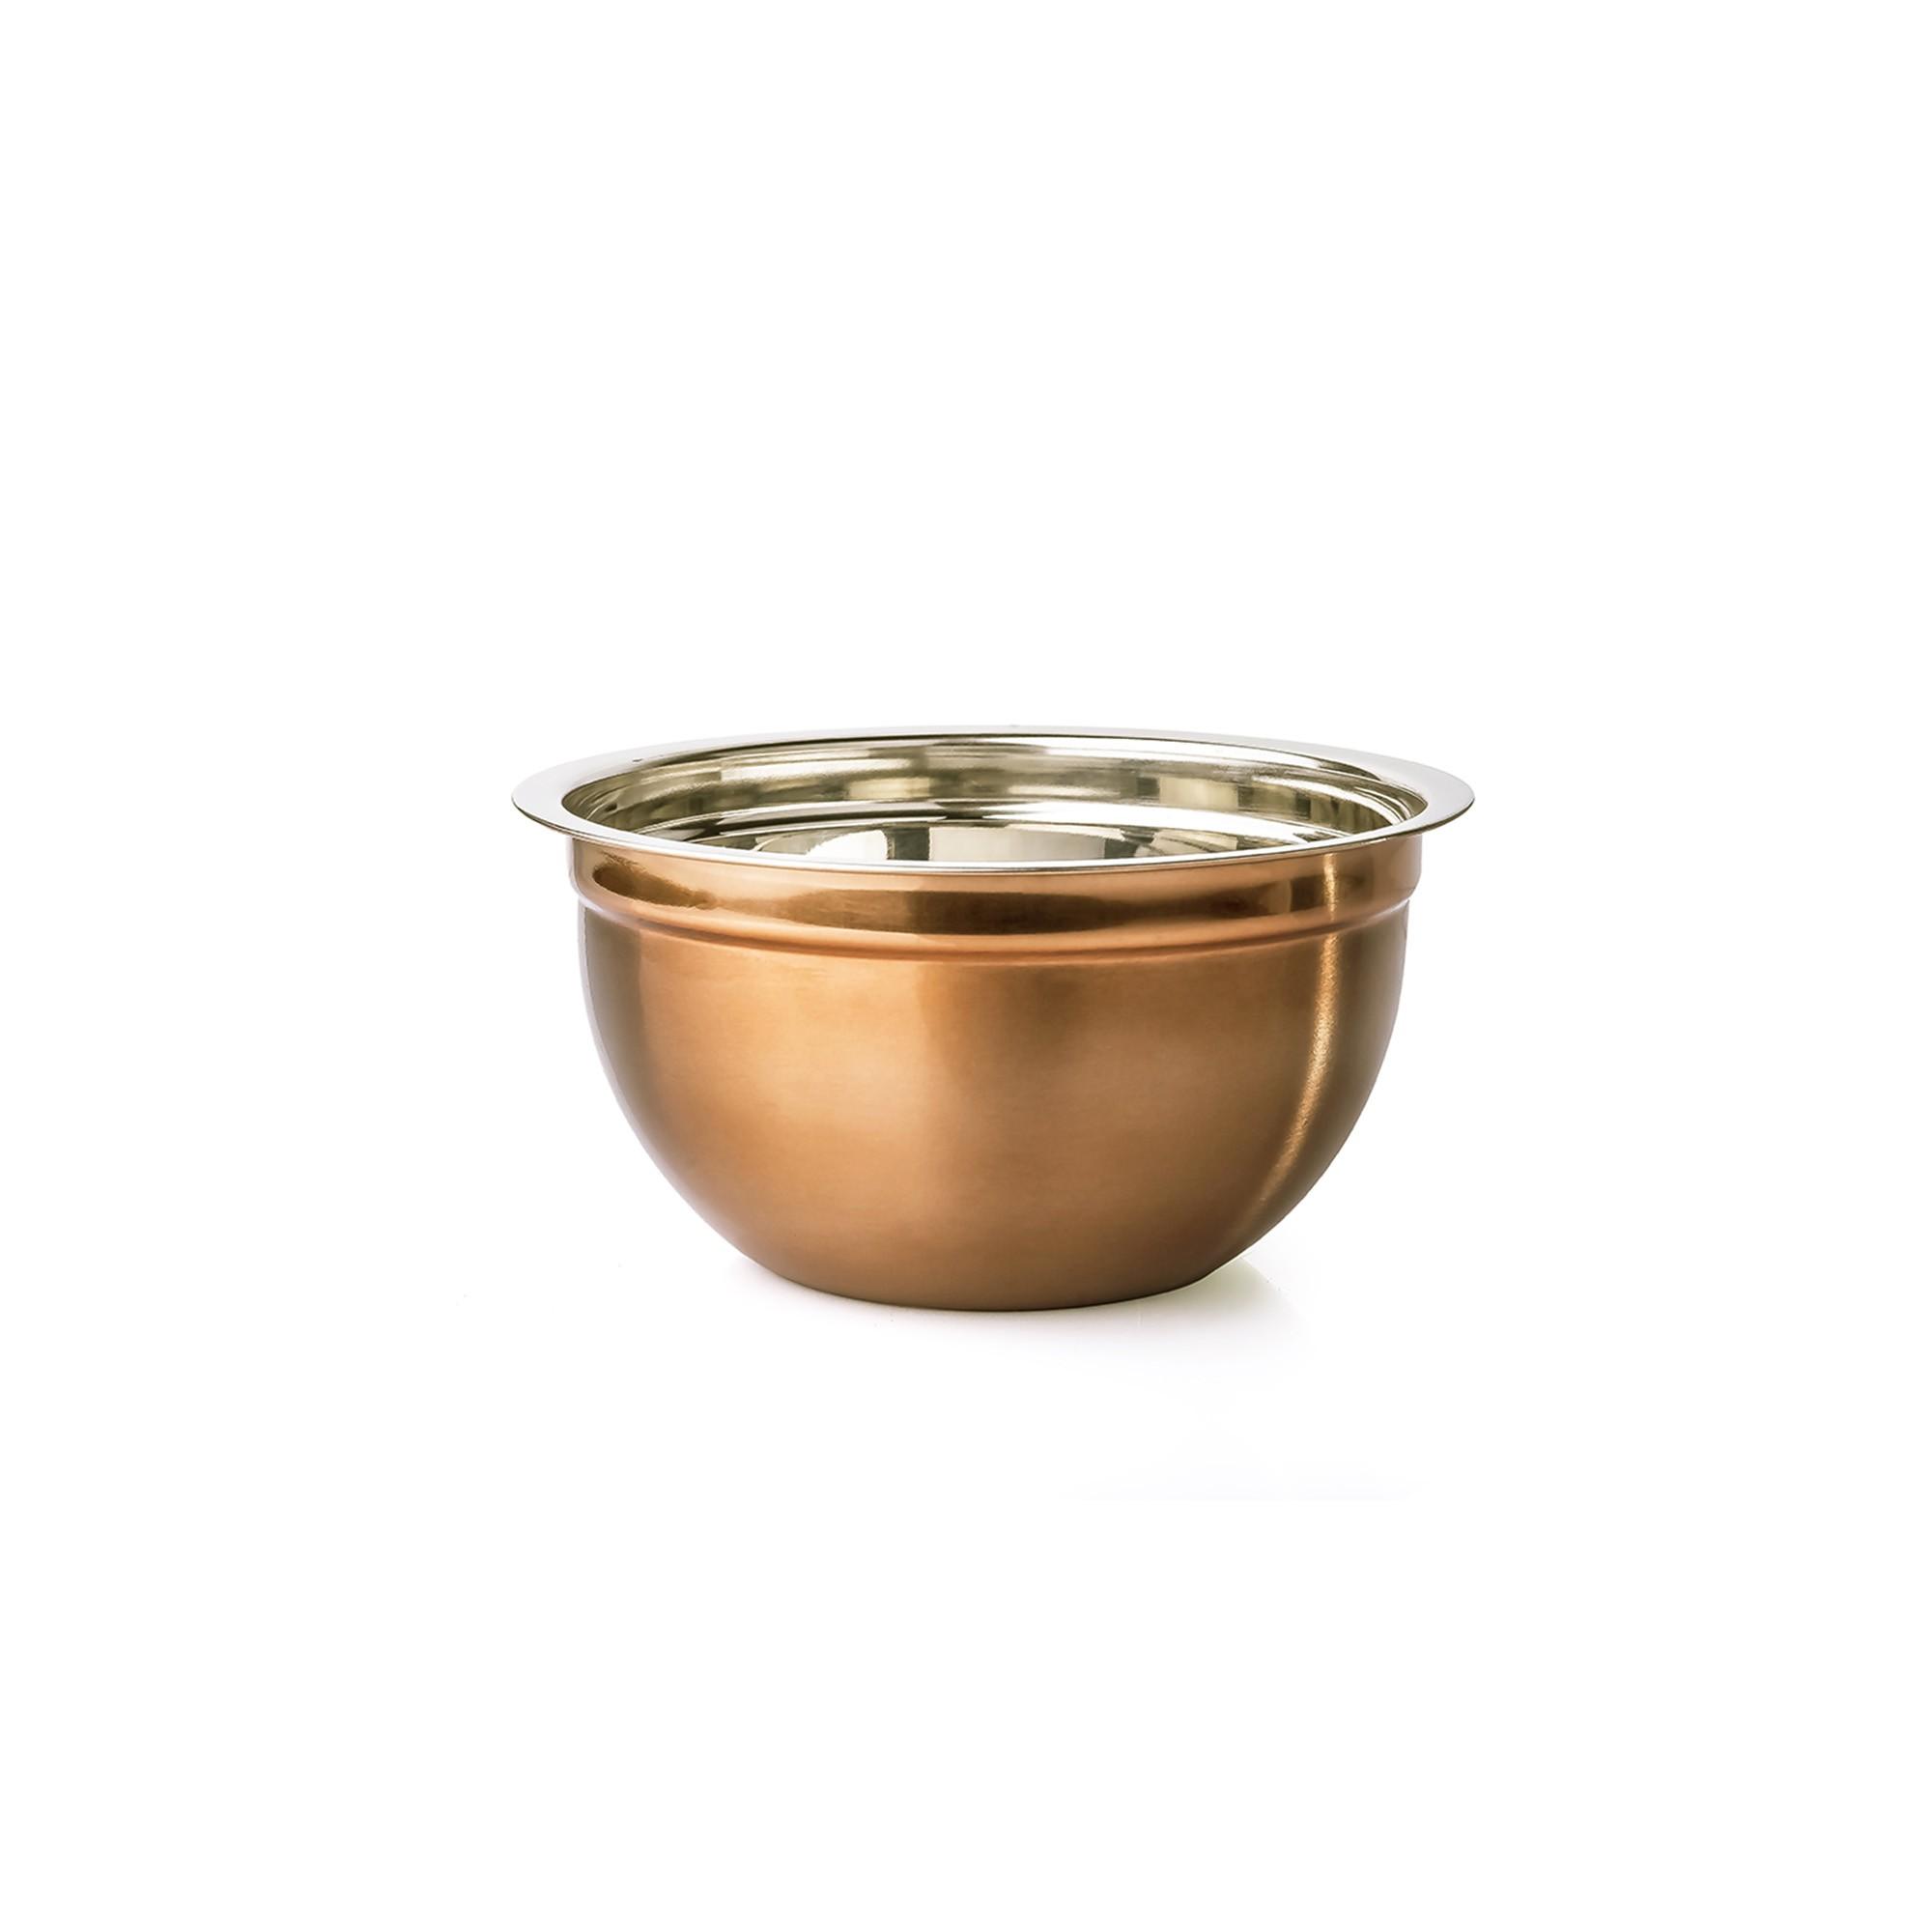 Bowl Cobre 2,5 Litros Inox Attuale